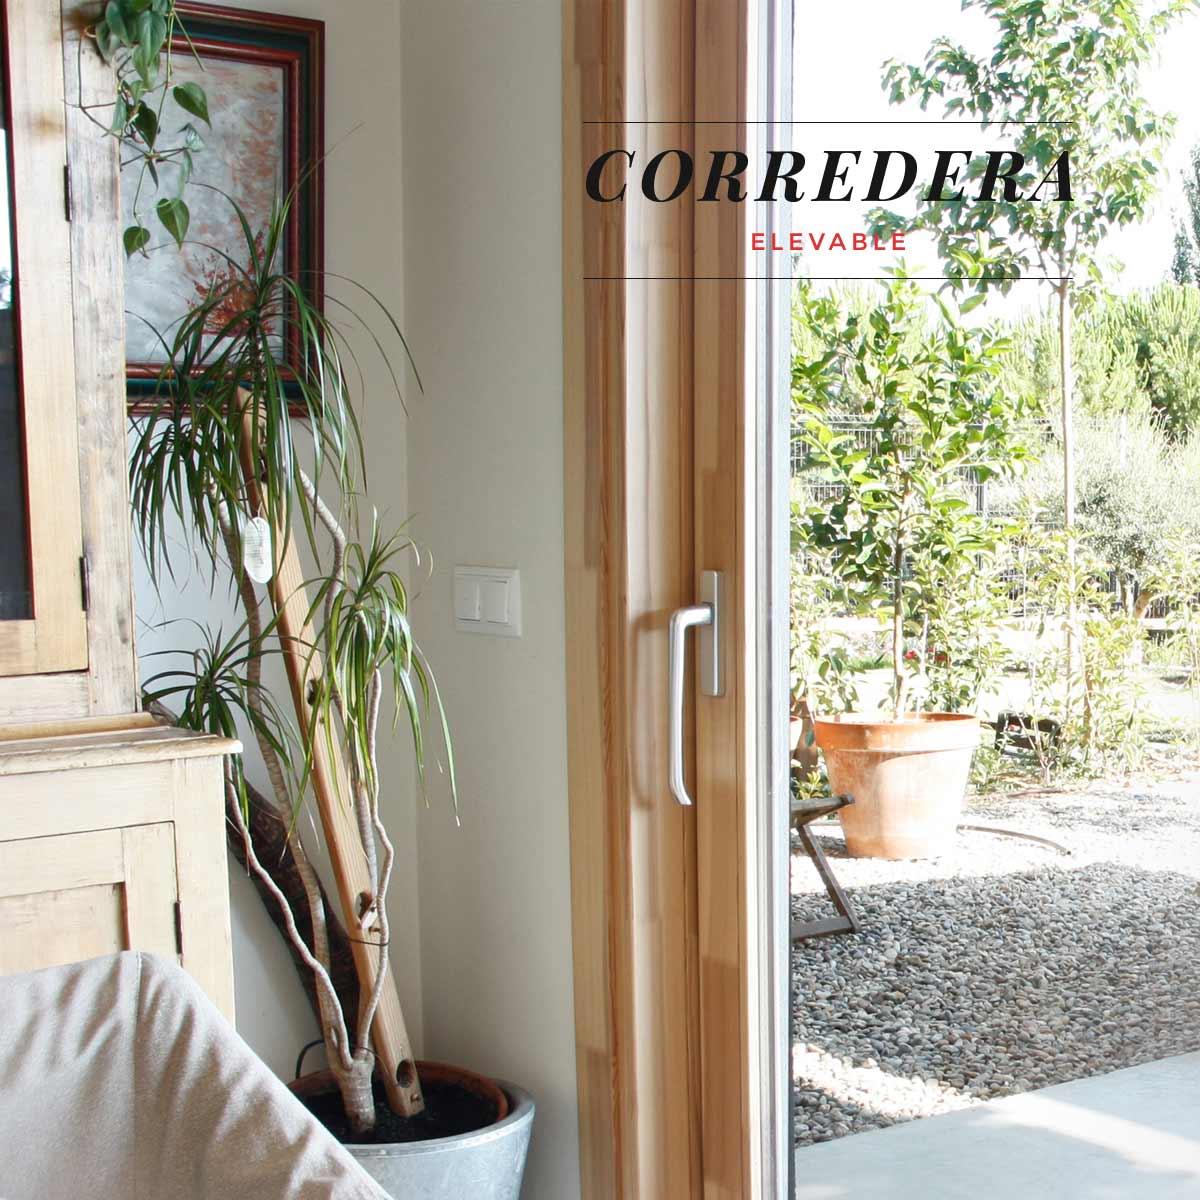 Carreté Finestres - finestra de fusta corredera elevadora